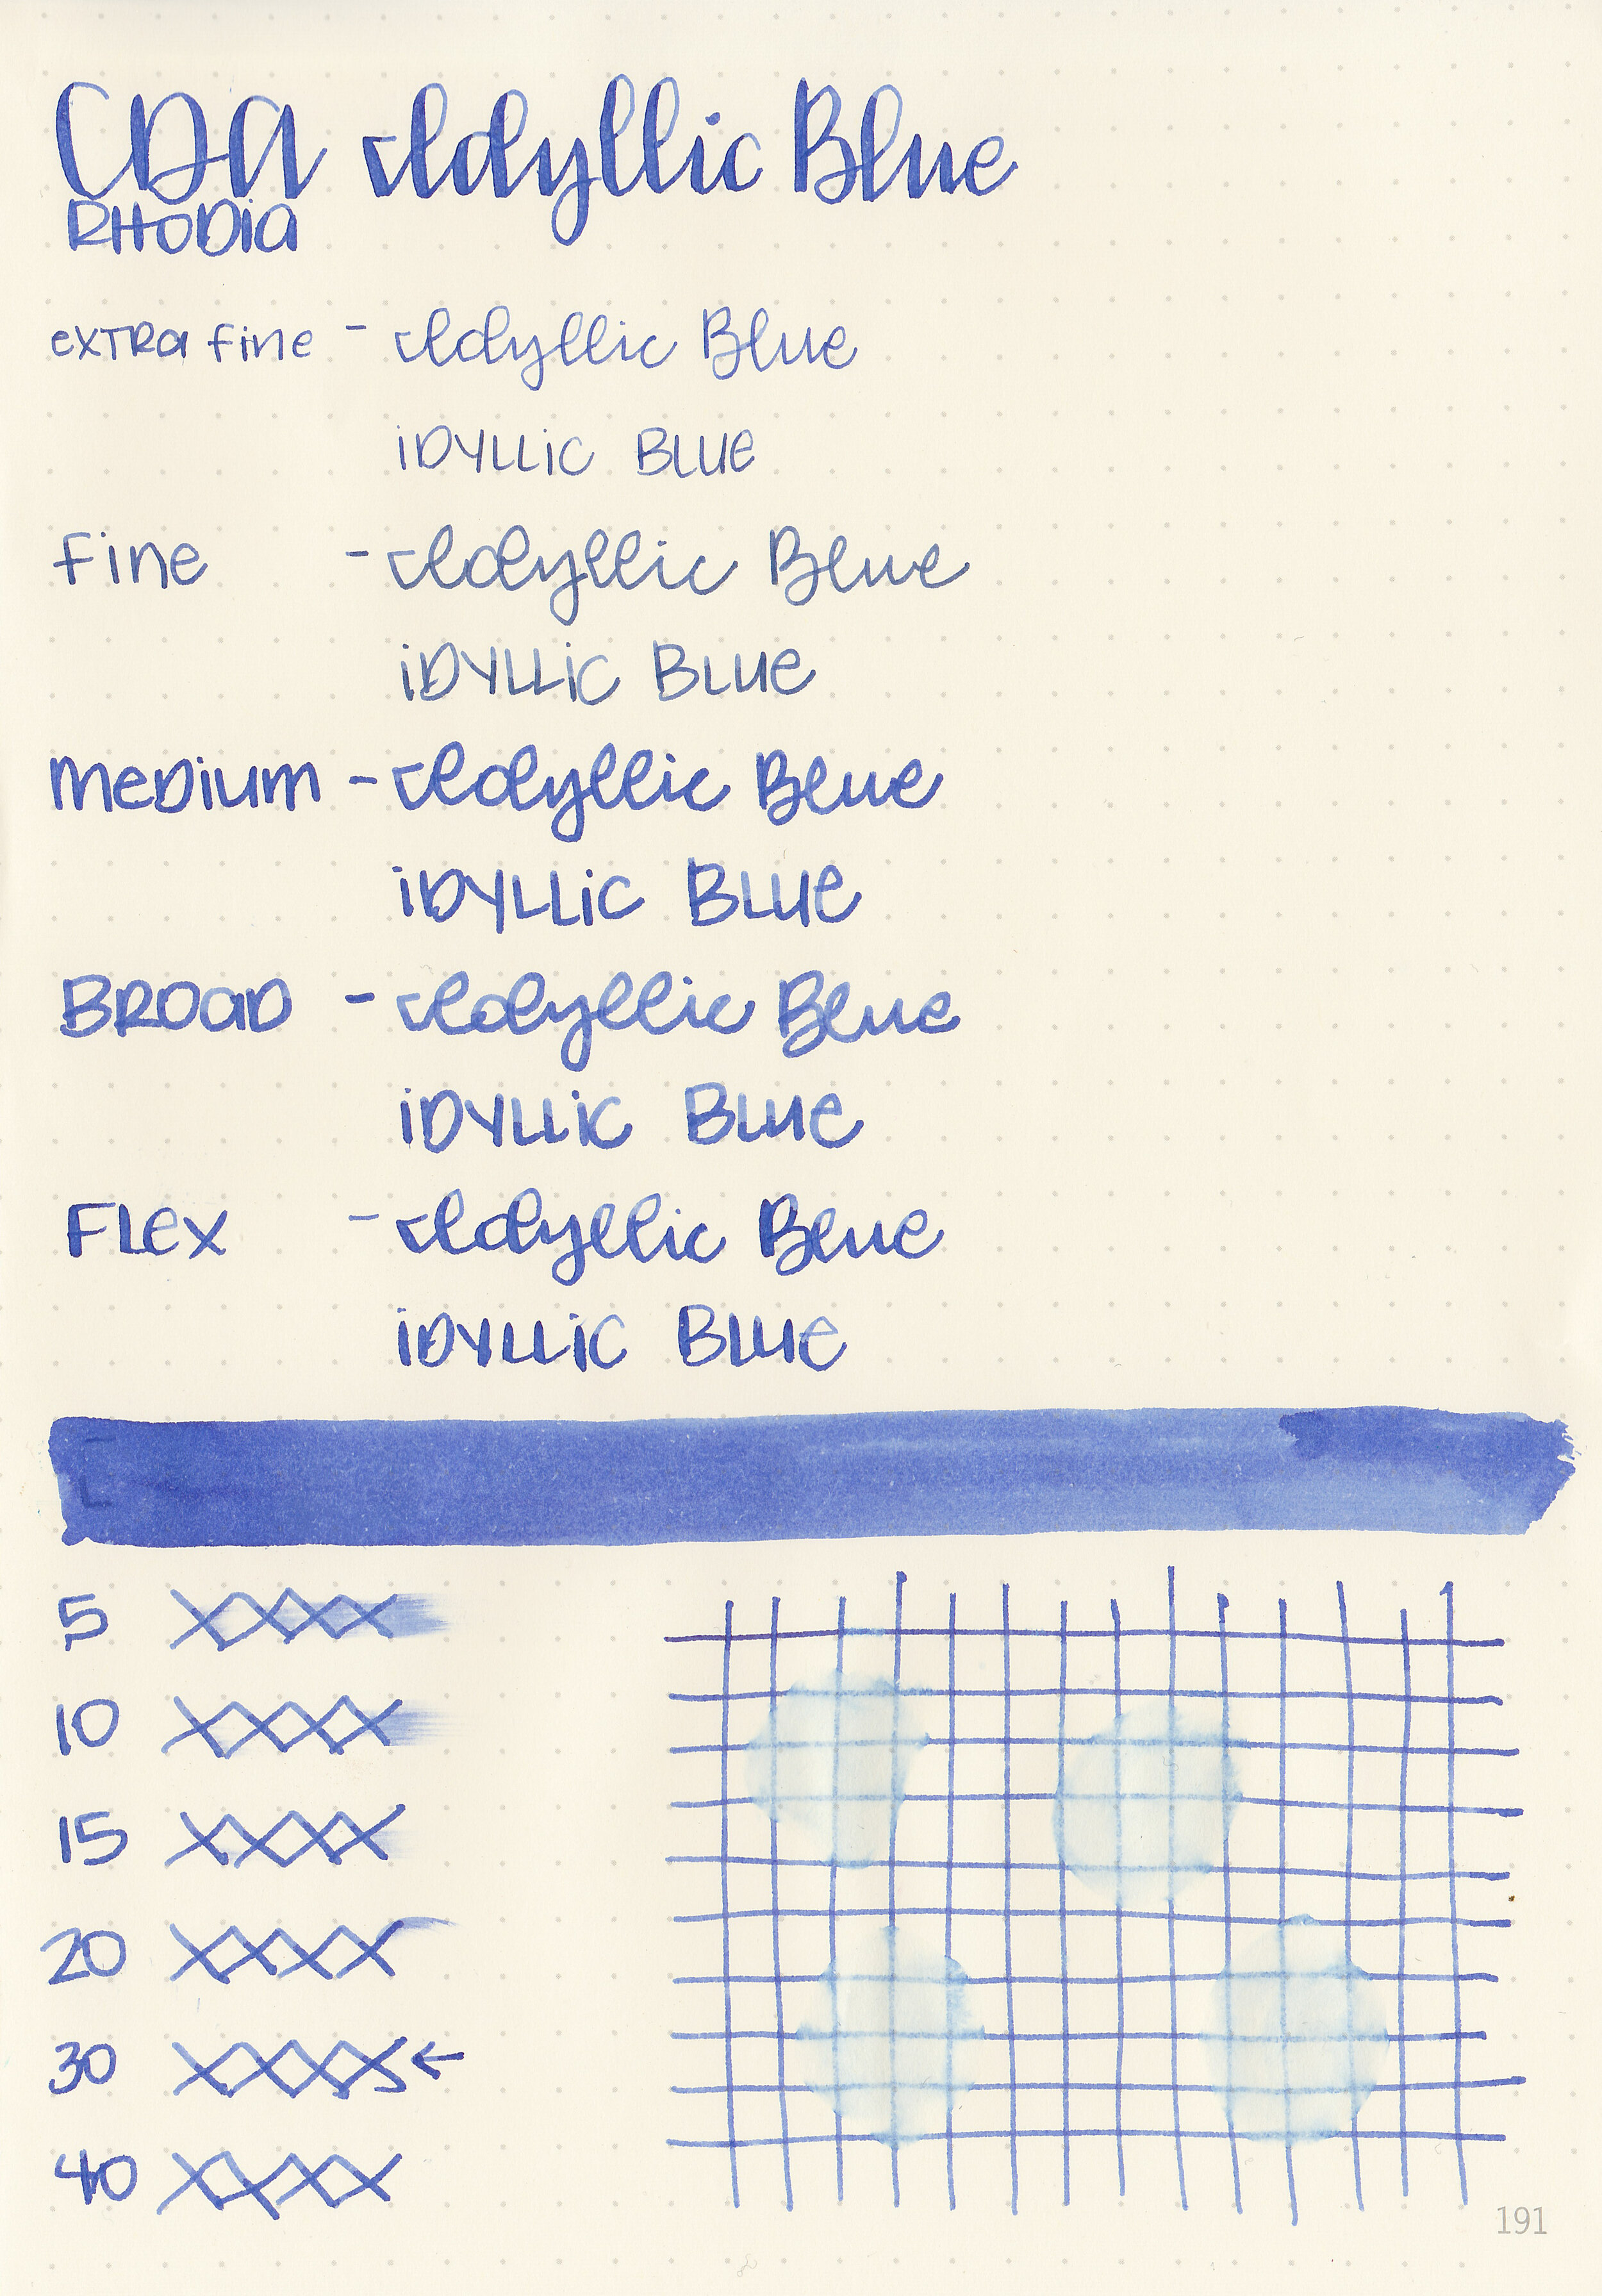 cda-idyllic-blue-5.jpg